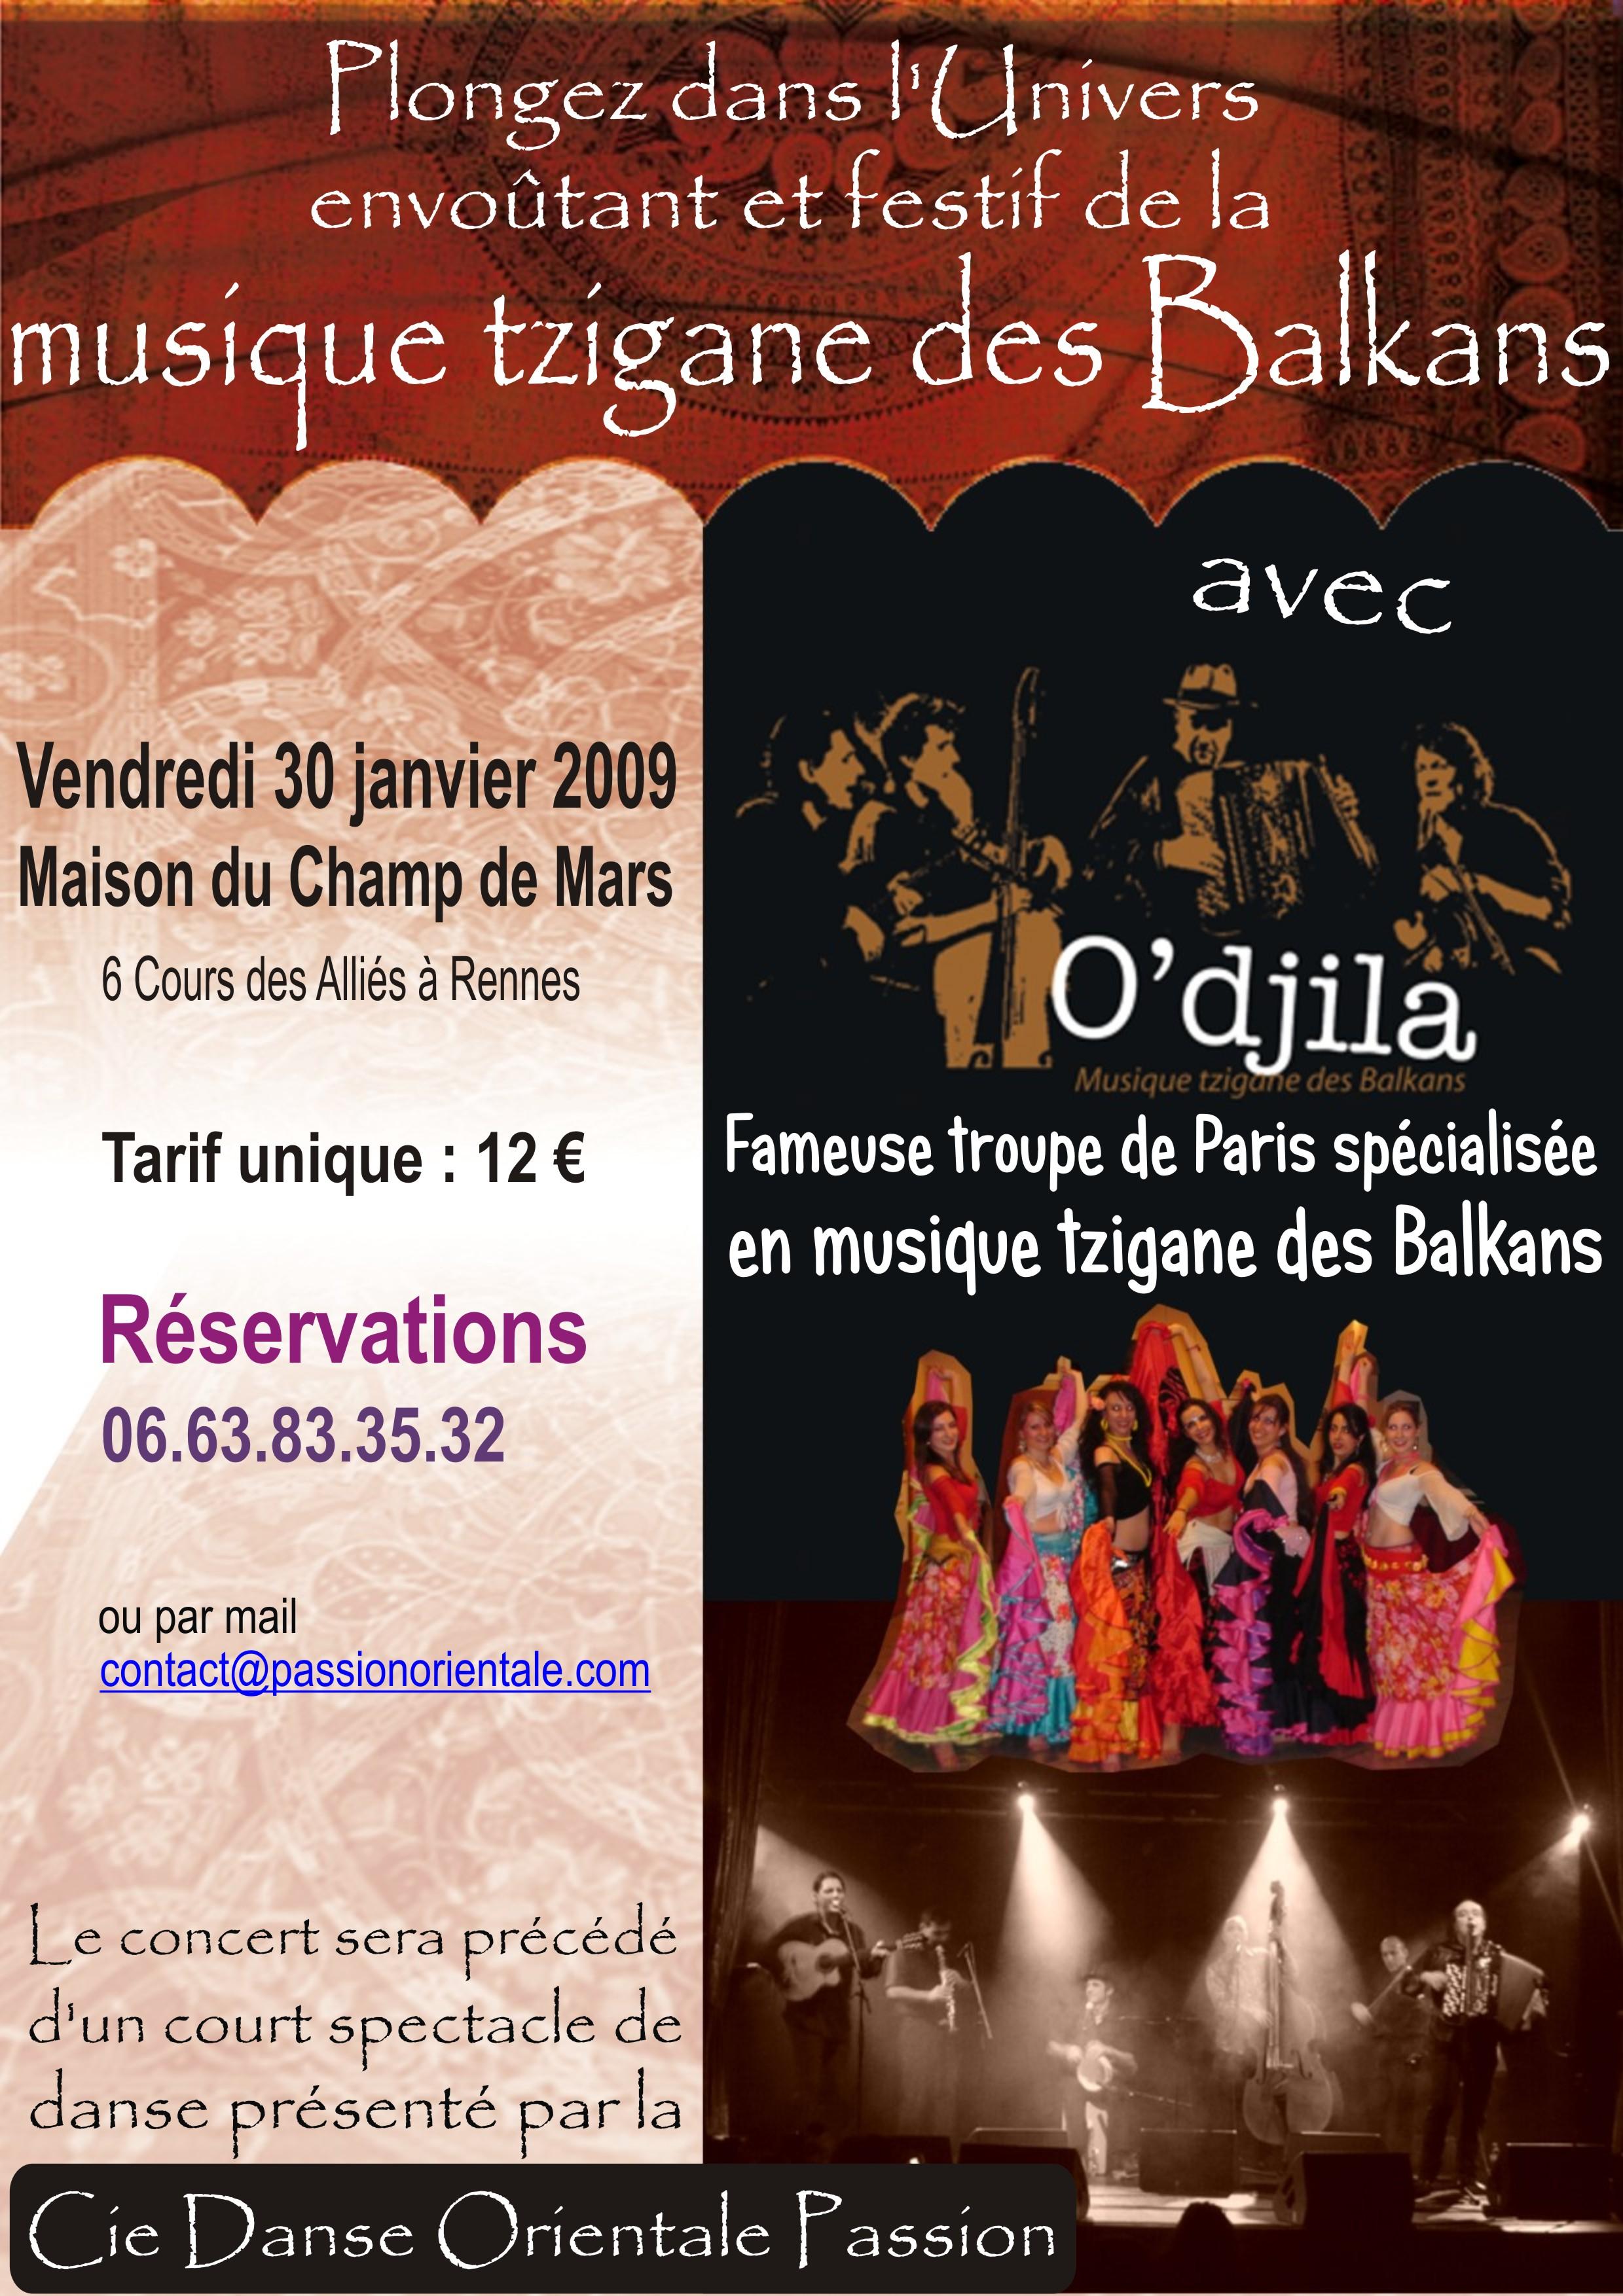 Affiche du spectacle avec O'Djila -2009